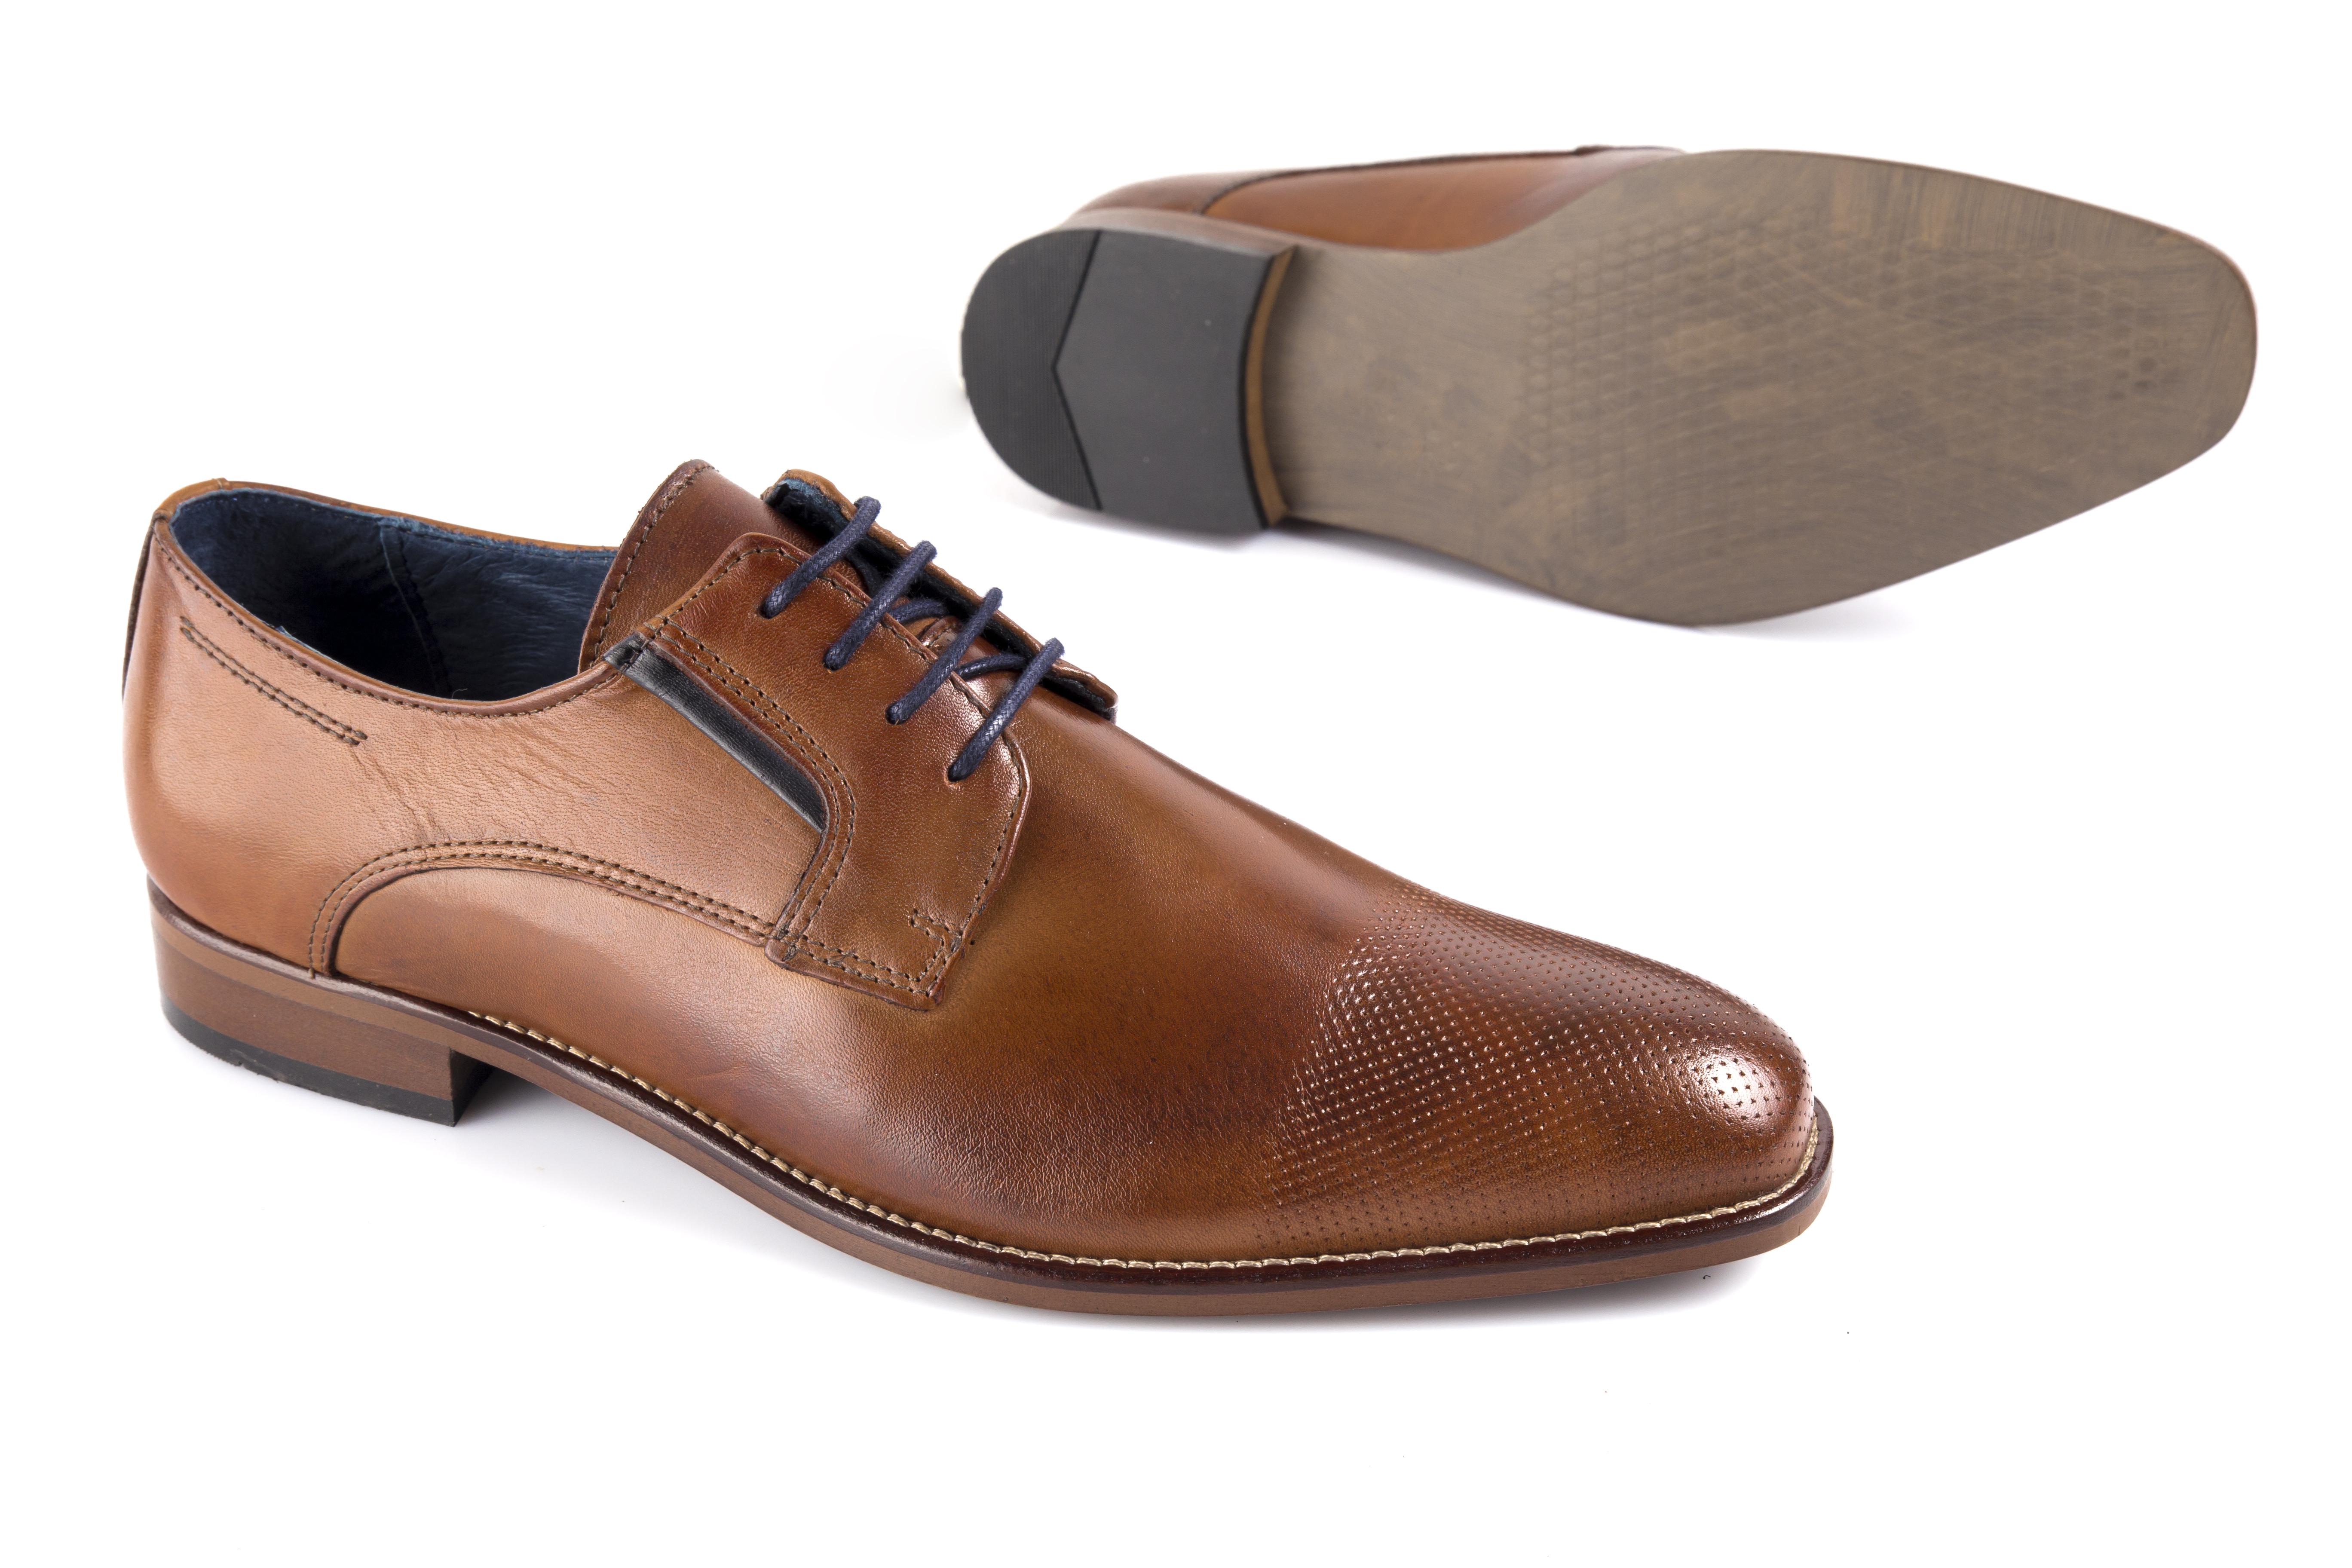 geinee for stylish women easy traveltime segeinee comforter originator of pz and es shoes walking comfortable the pg antigravity spirit